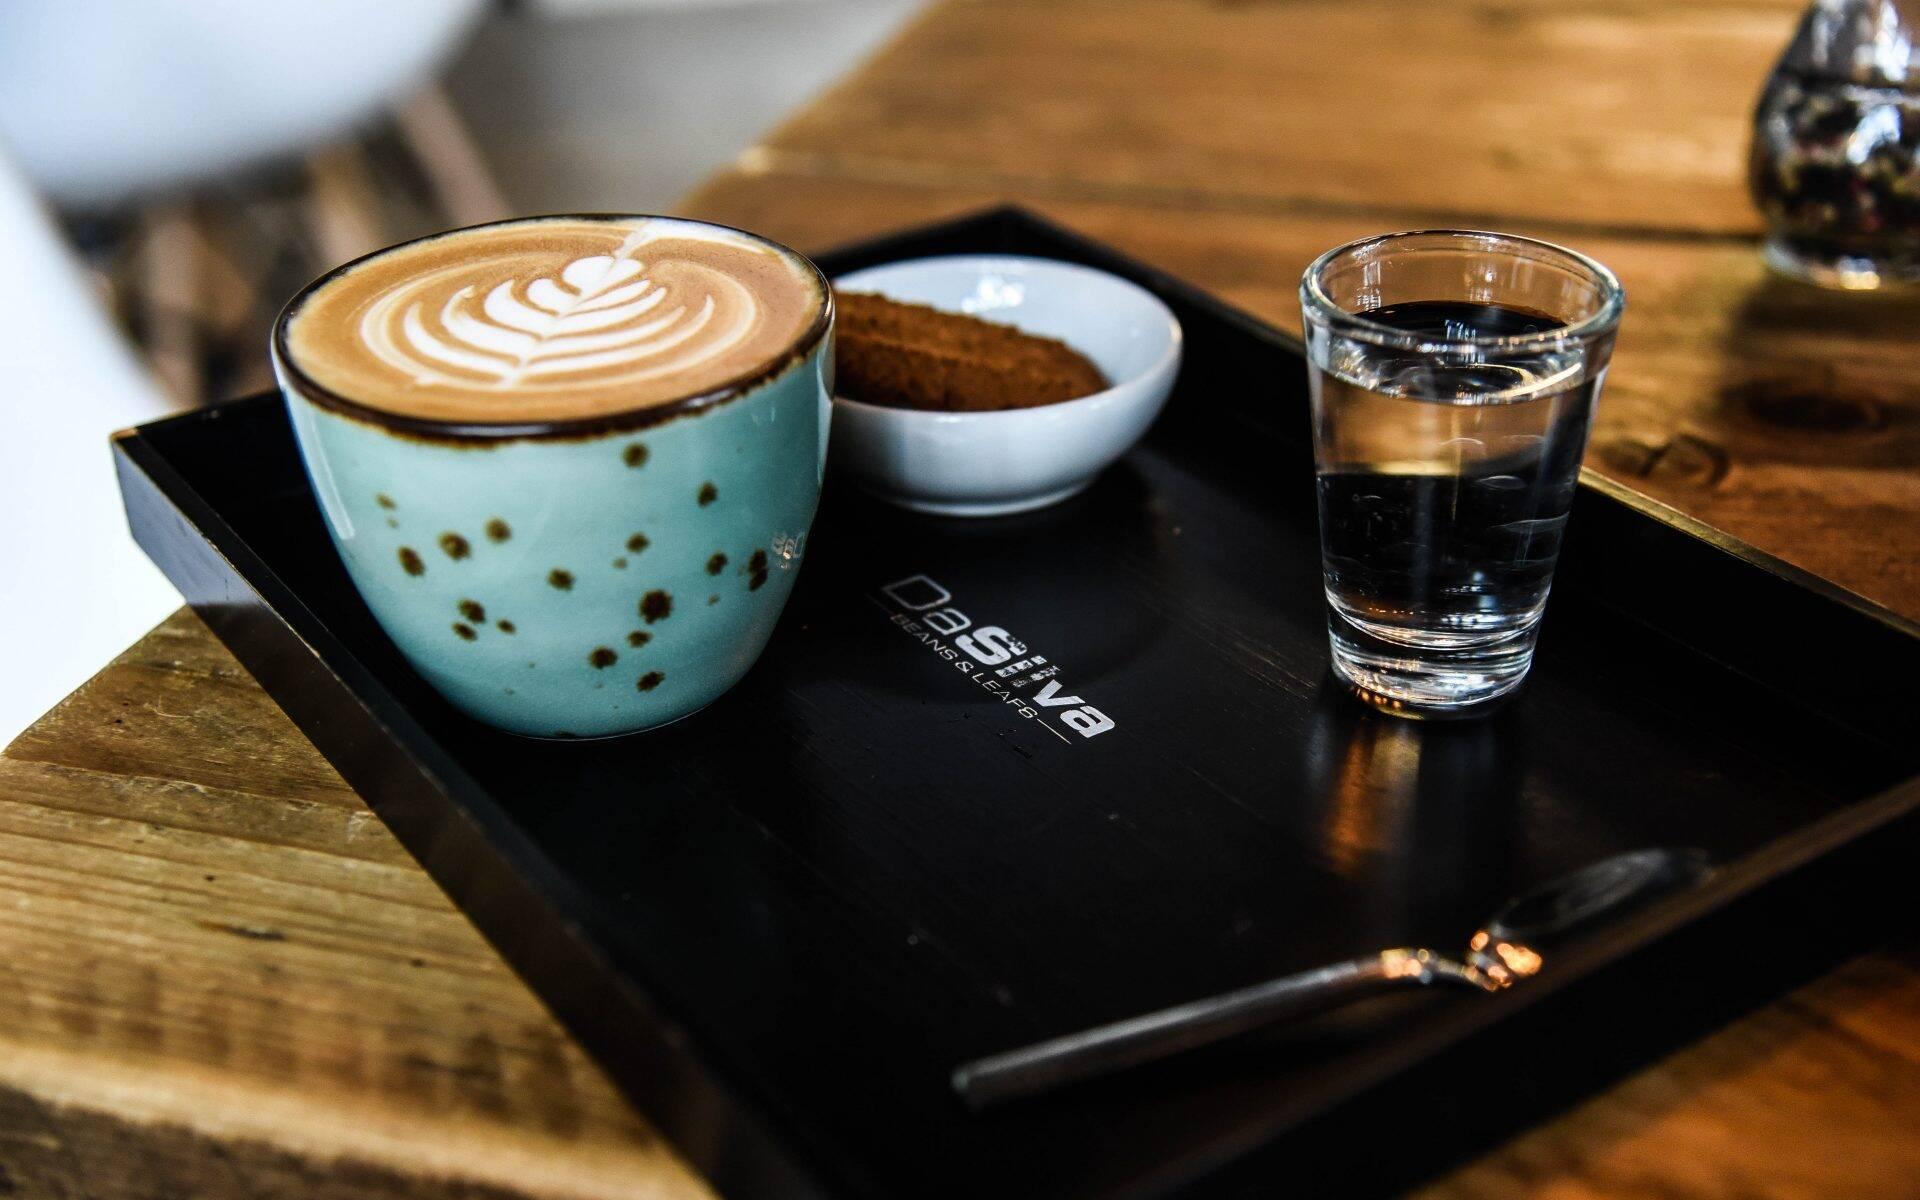 DaSilva Espressobar & Stadskoffiebranderij